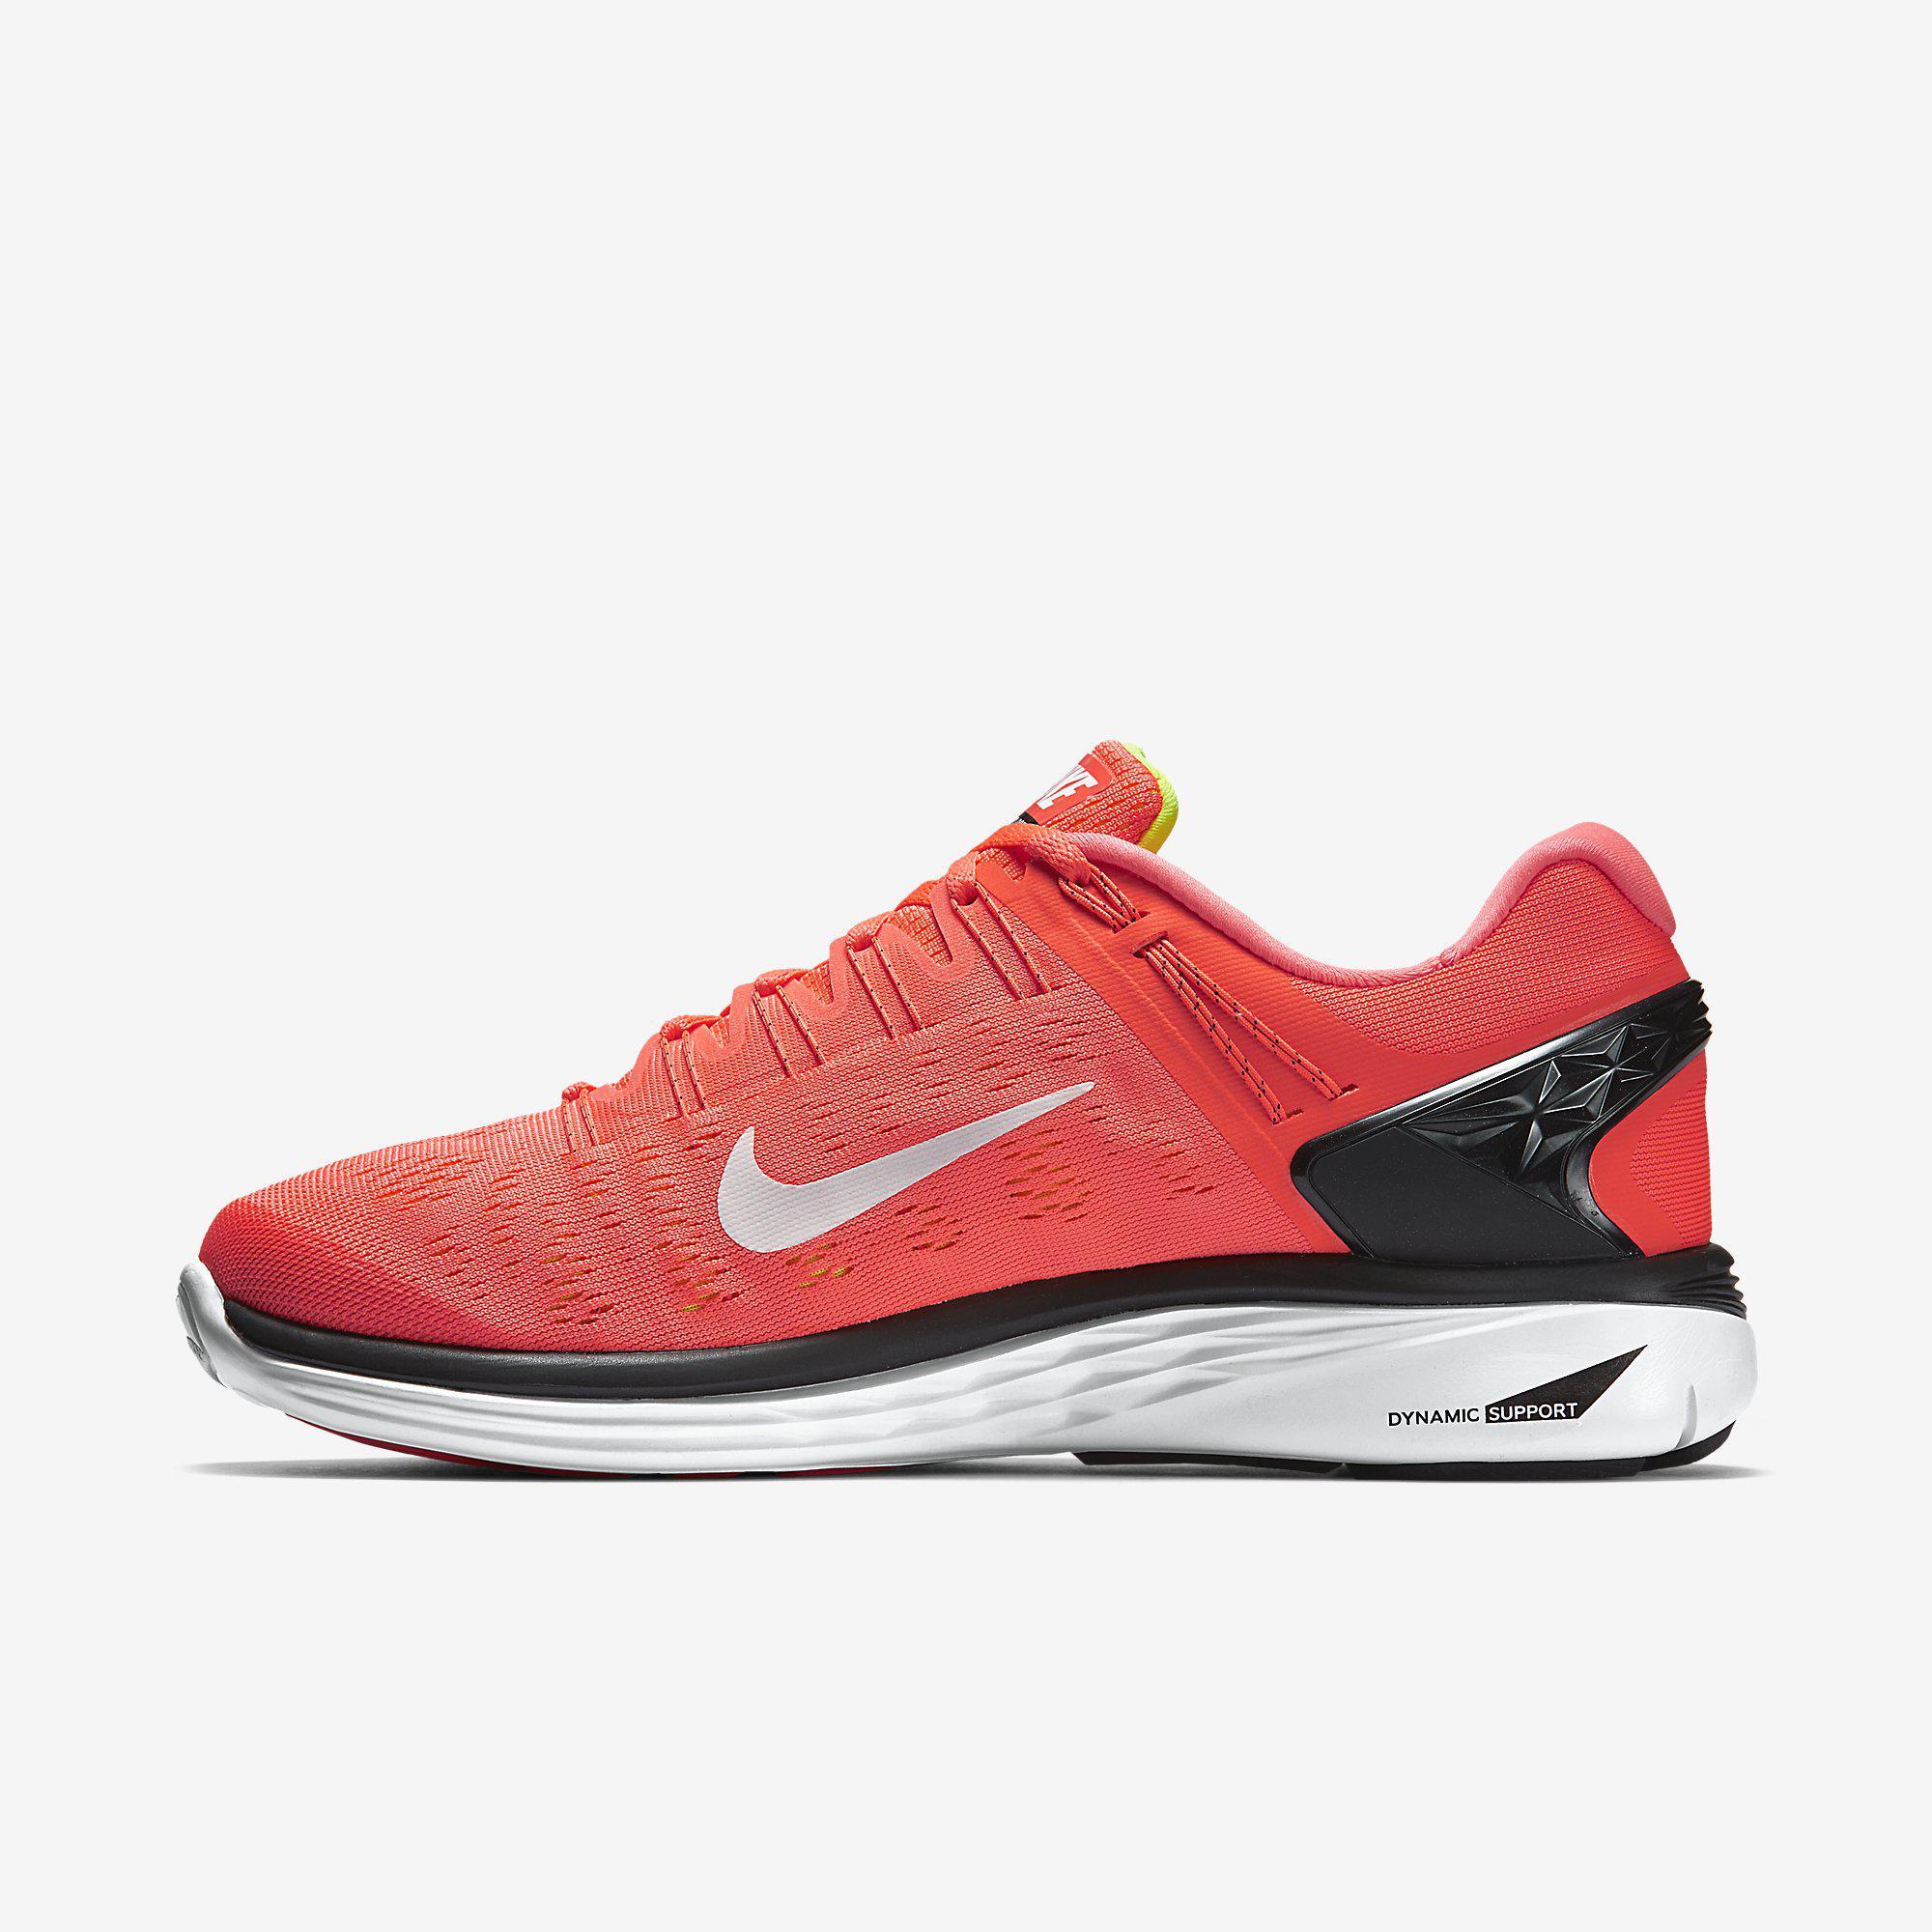 Nike Mens LunarEclipse 5 Running Shoes - Hot Lava/Volt